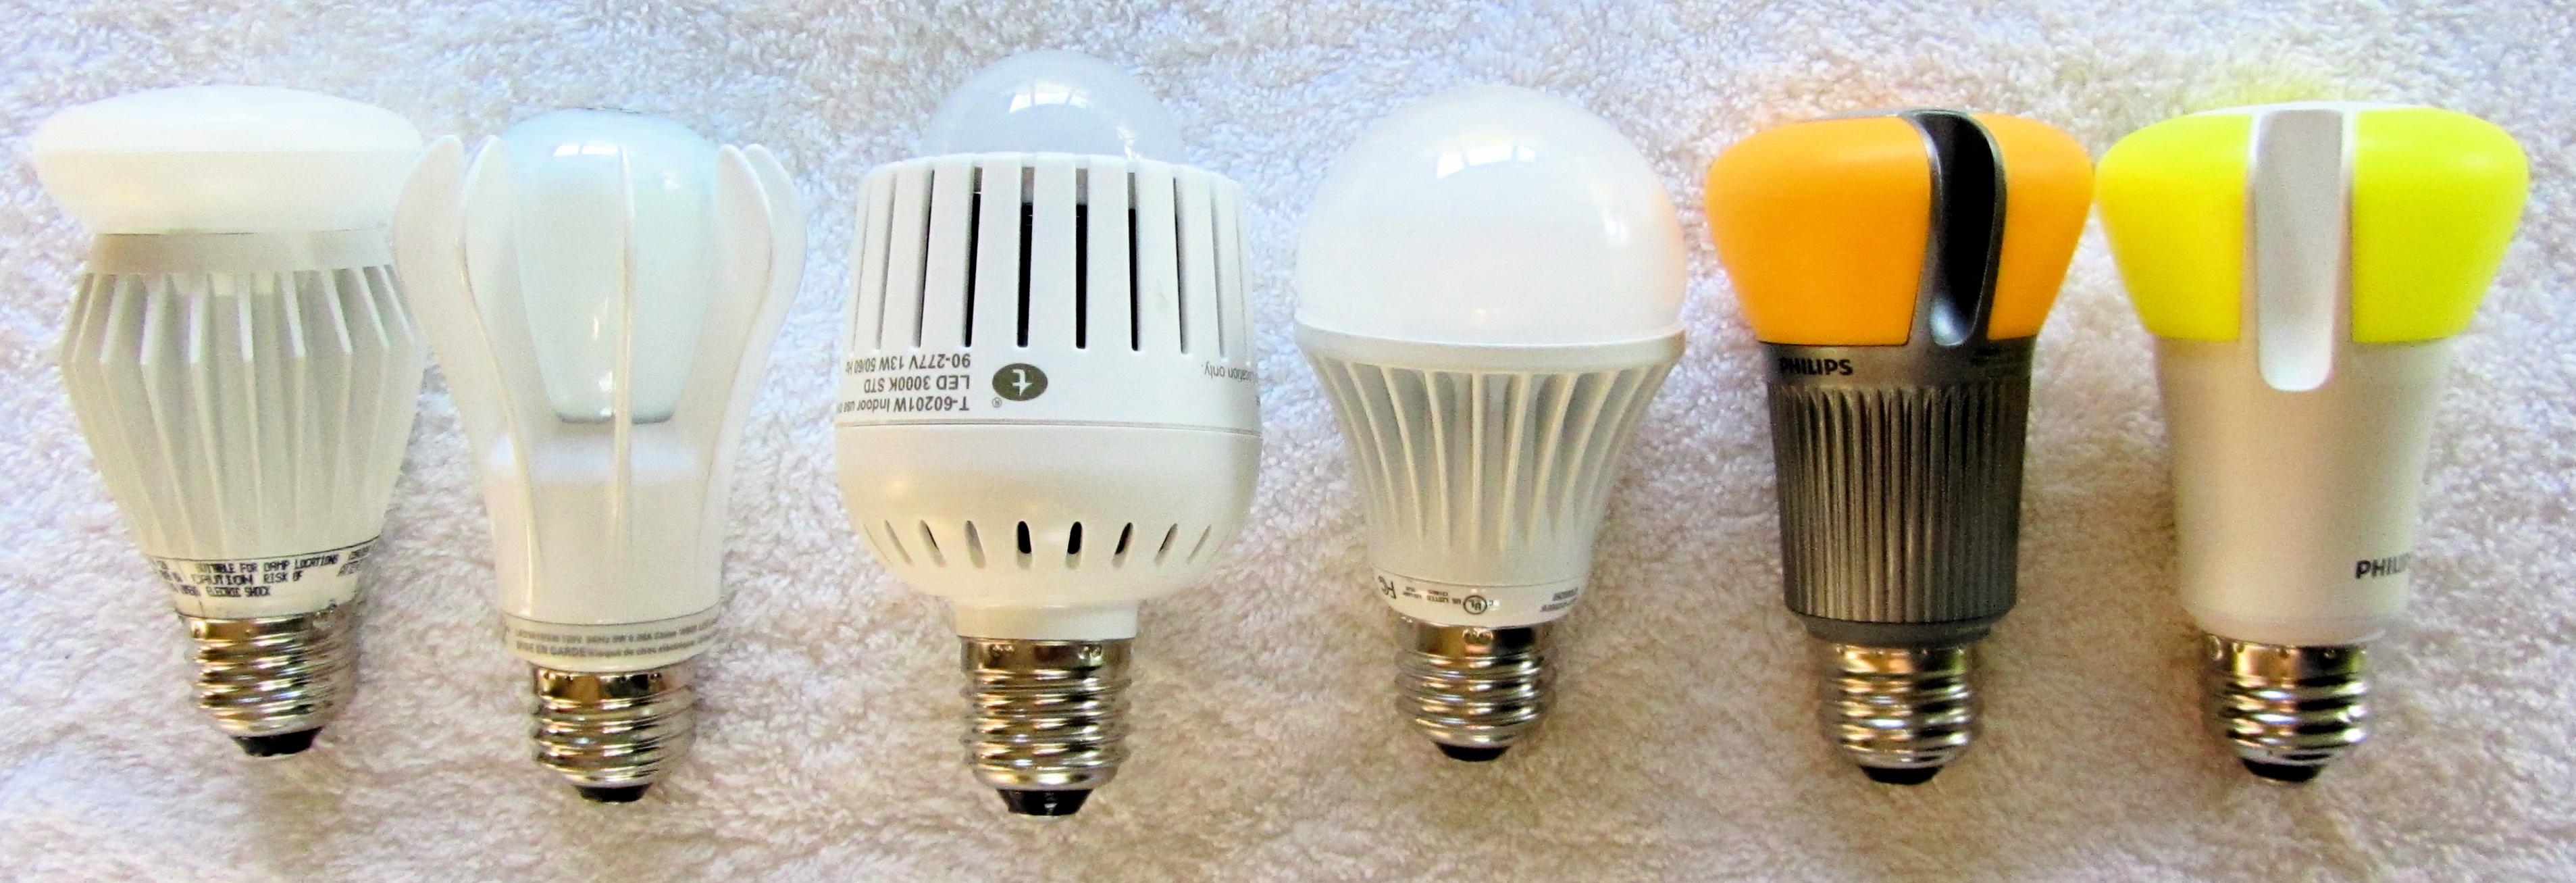 FileLED bulbs 2012.jpg & File:LED bulbs 2012.jpg - Wikimedia Commons azcodes.com